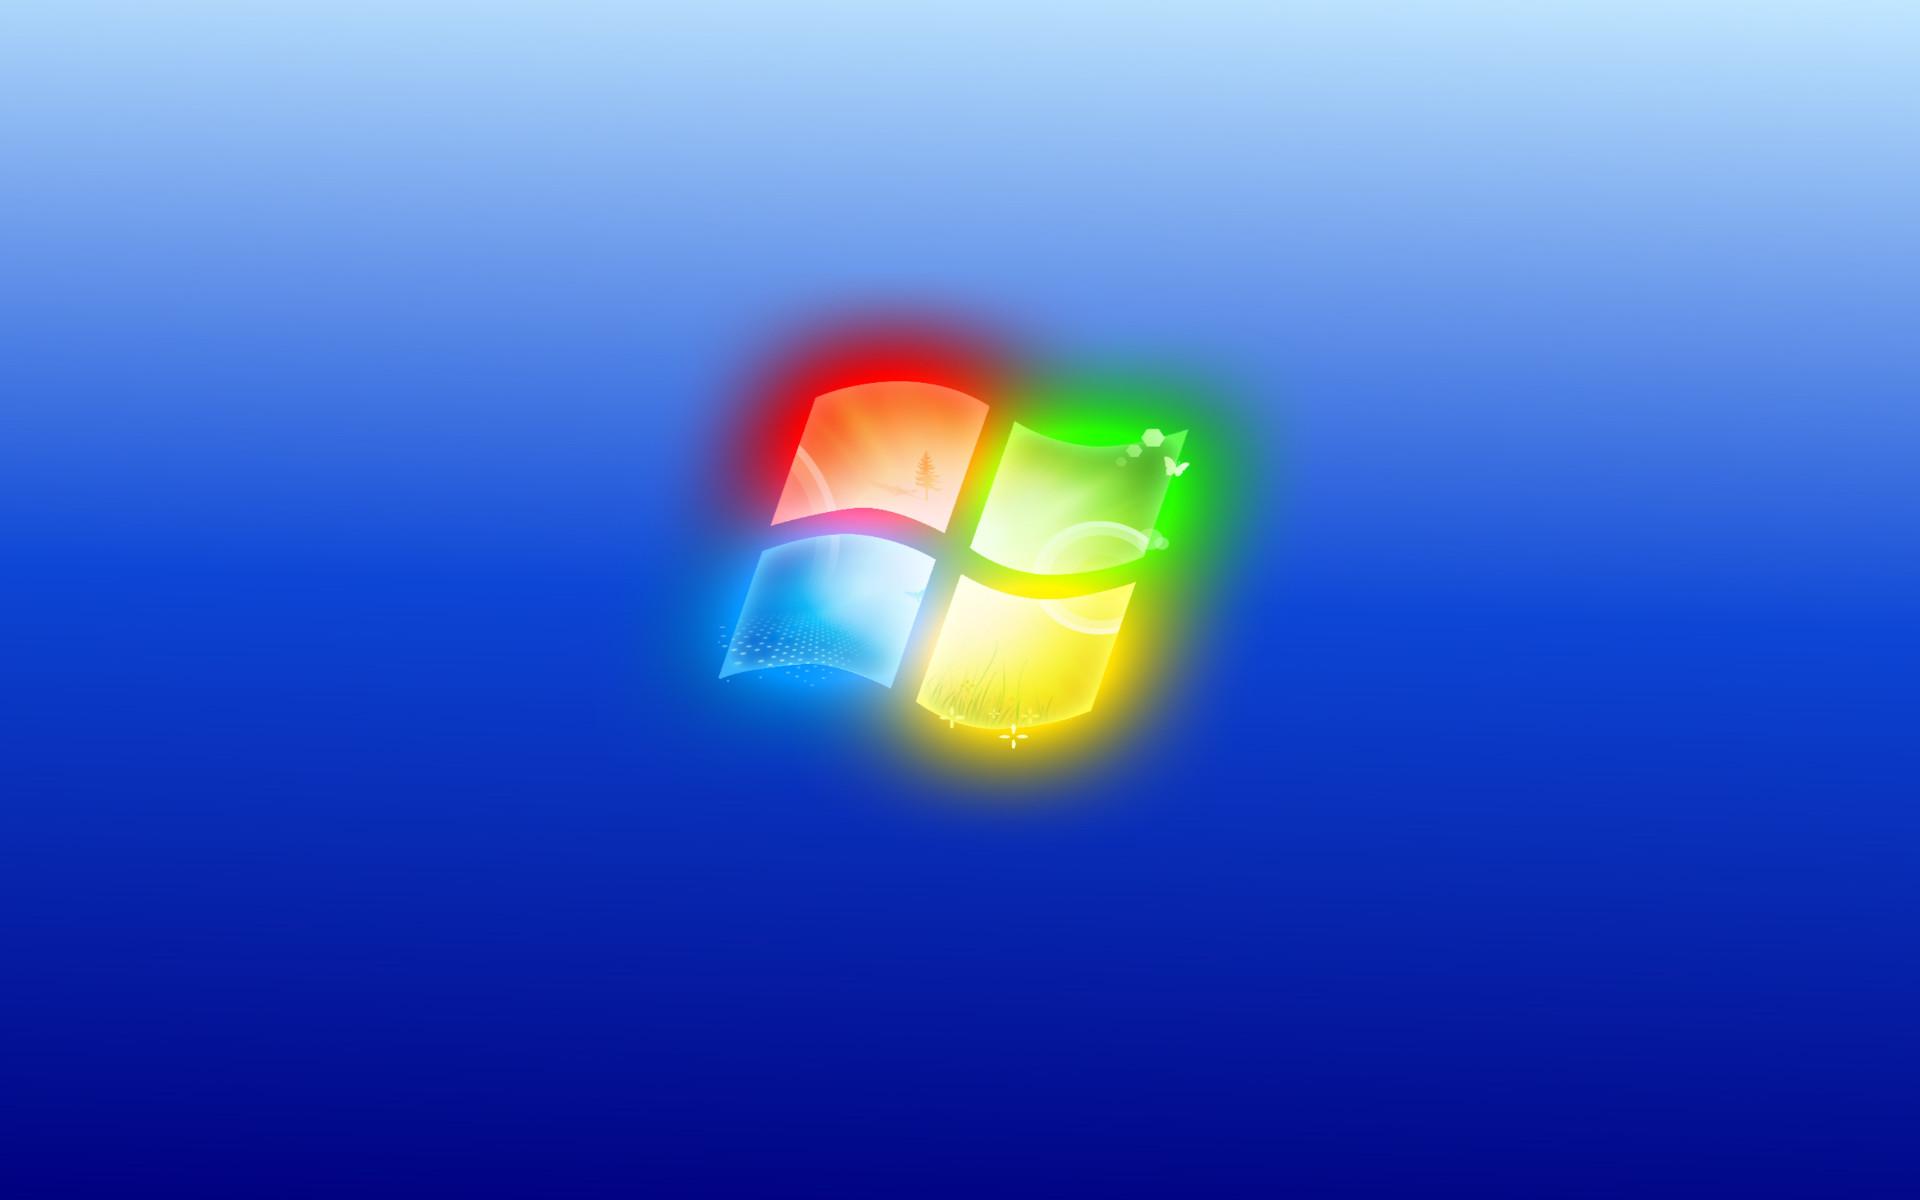 logonstudio, screensavers, explore, se7en, windows